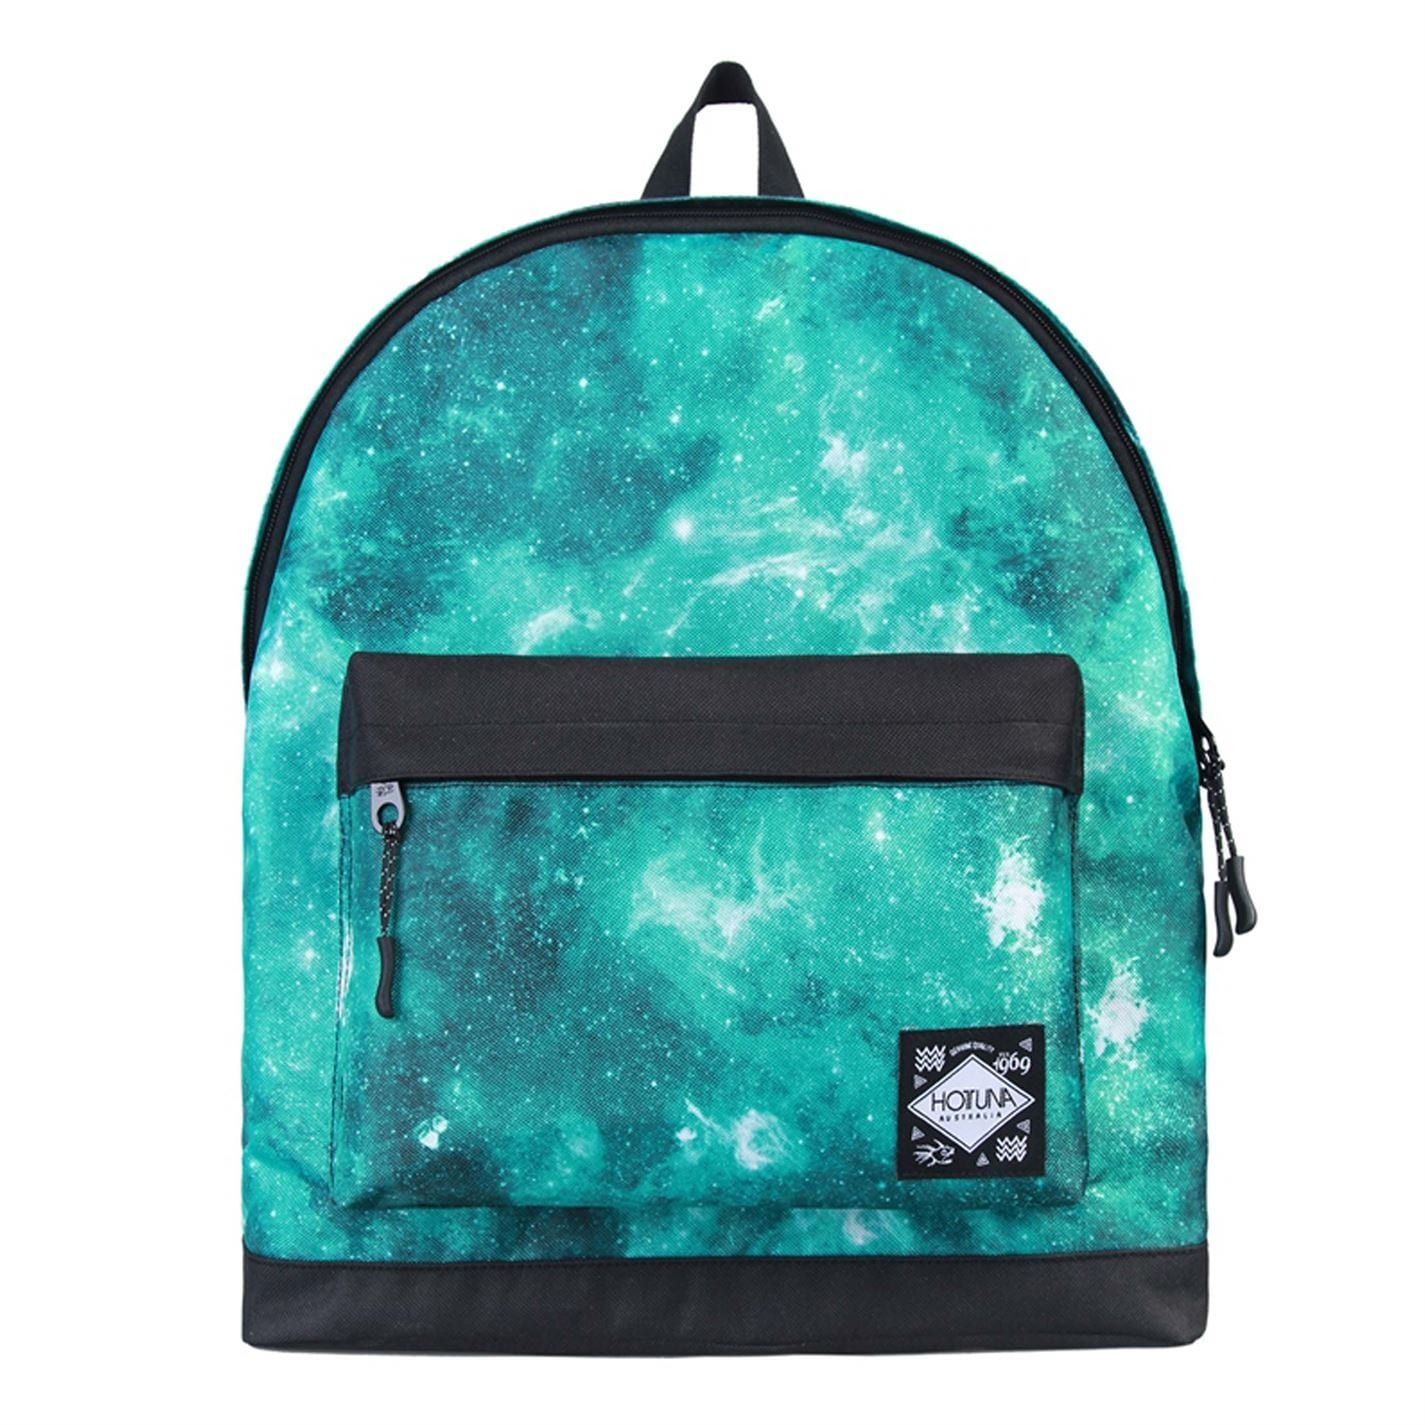 Hot Tuna Galaxy Back Pack Travel Luggage Rucksack Casual Bag